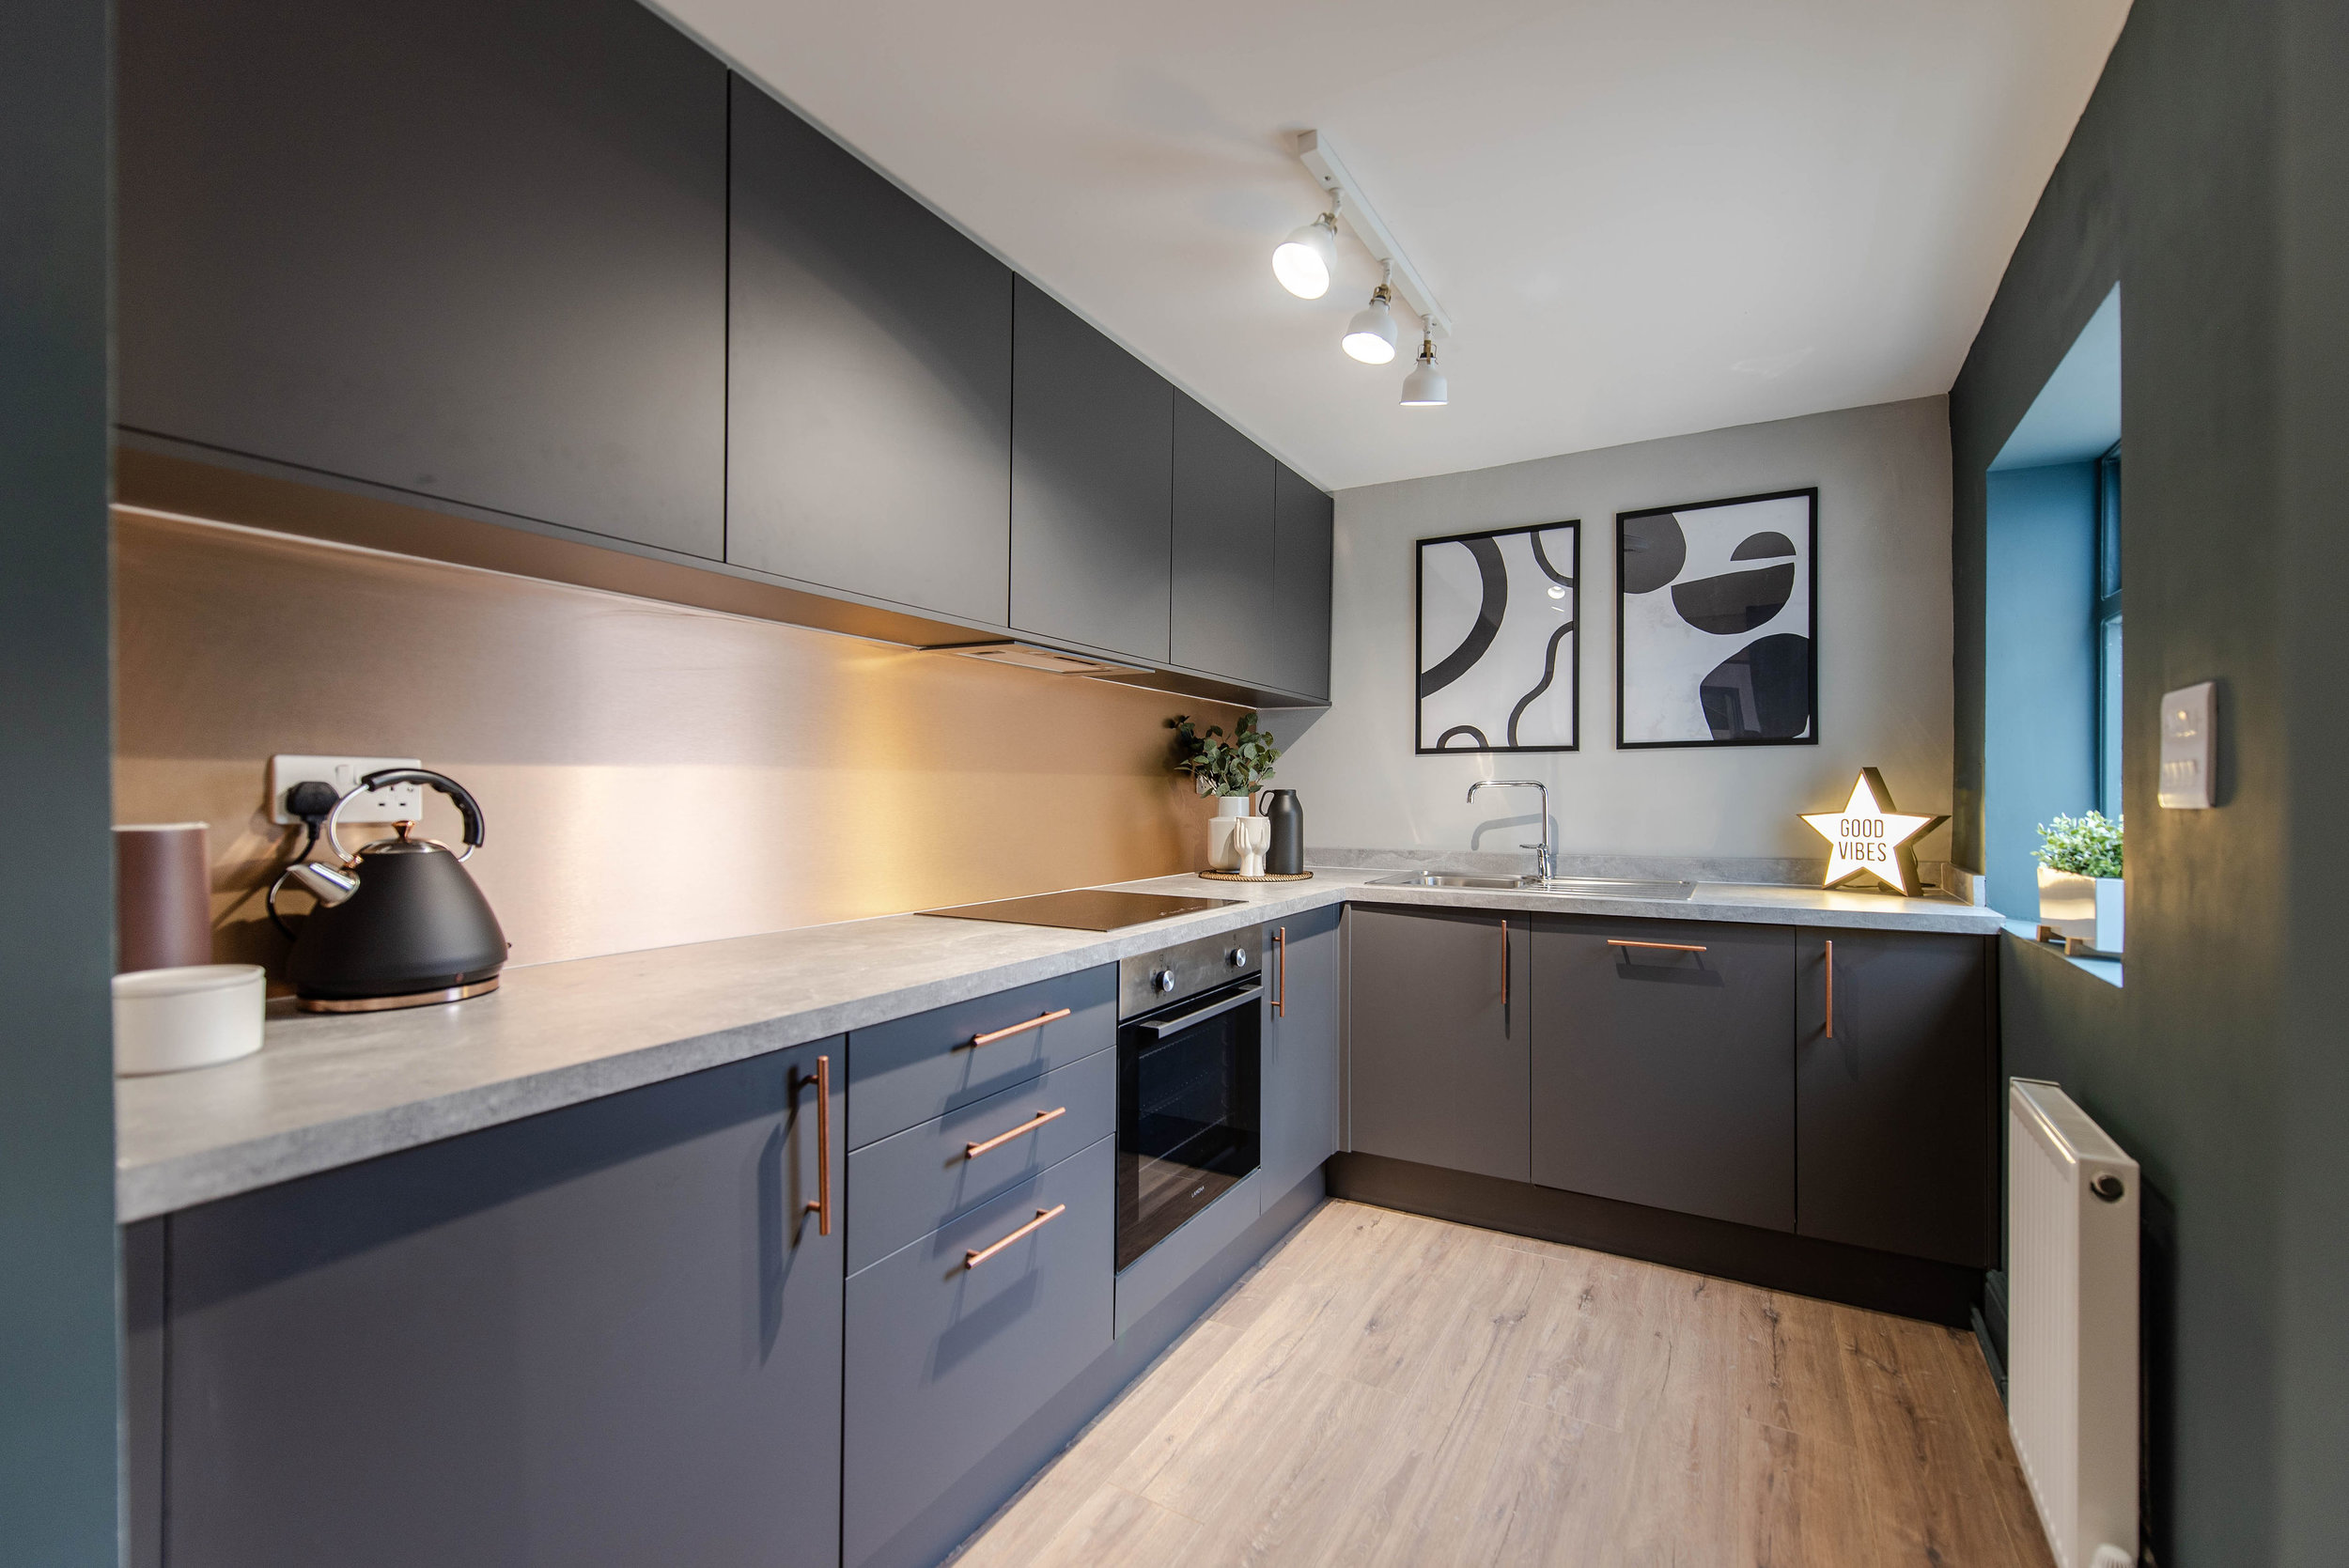 Professional HMO communal kitchen